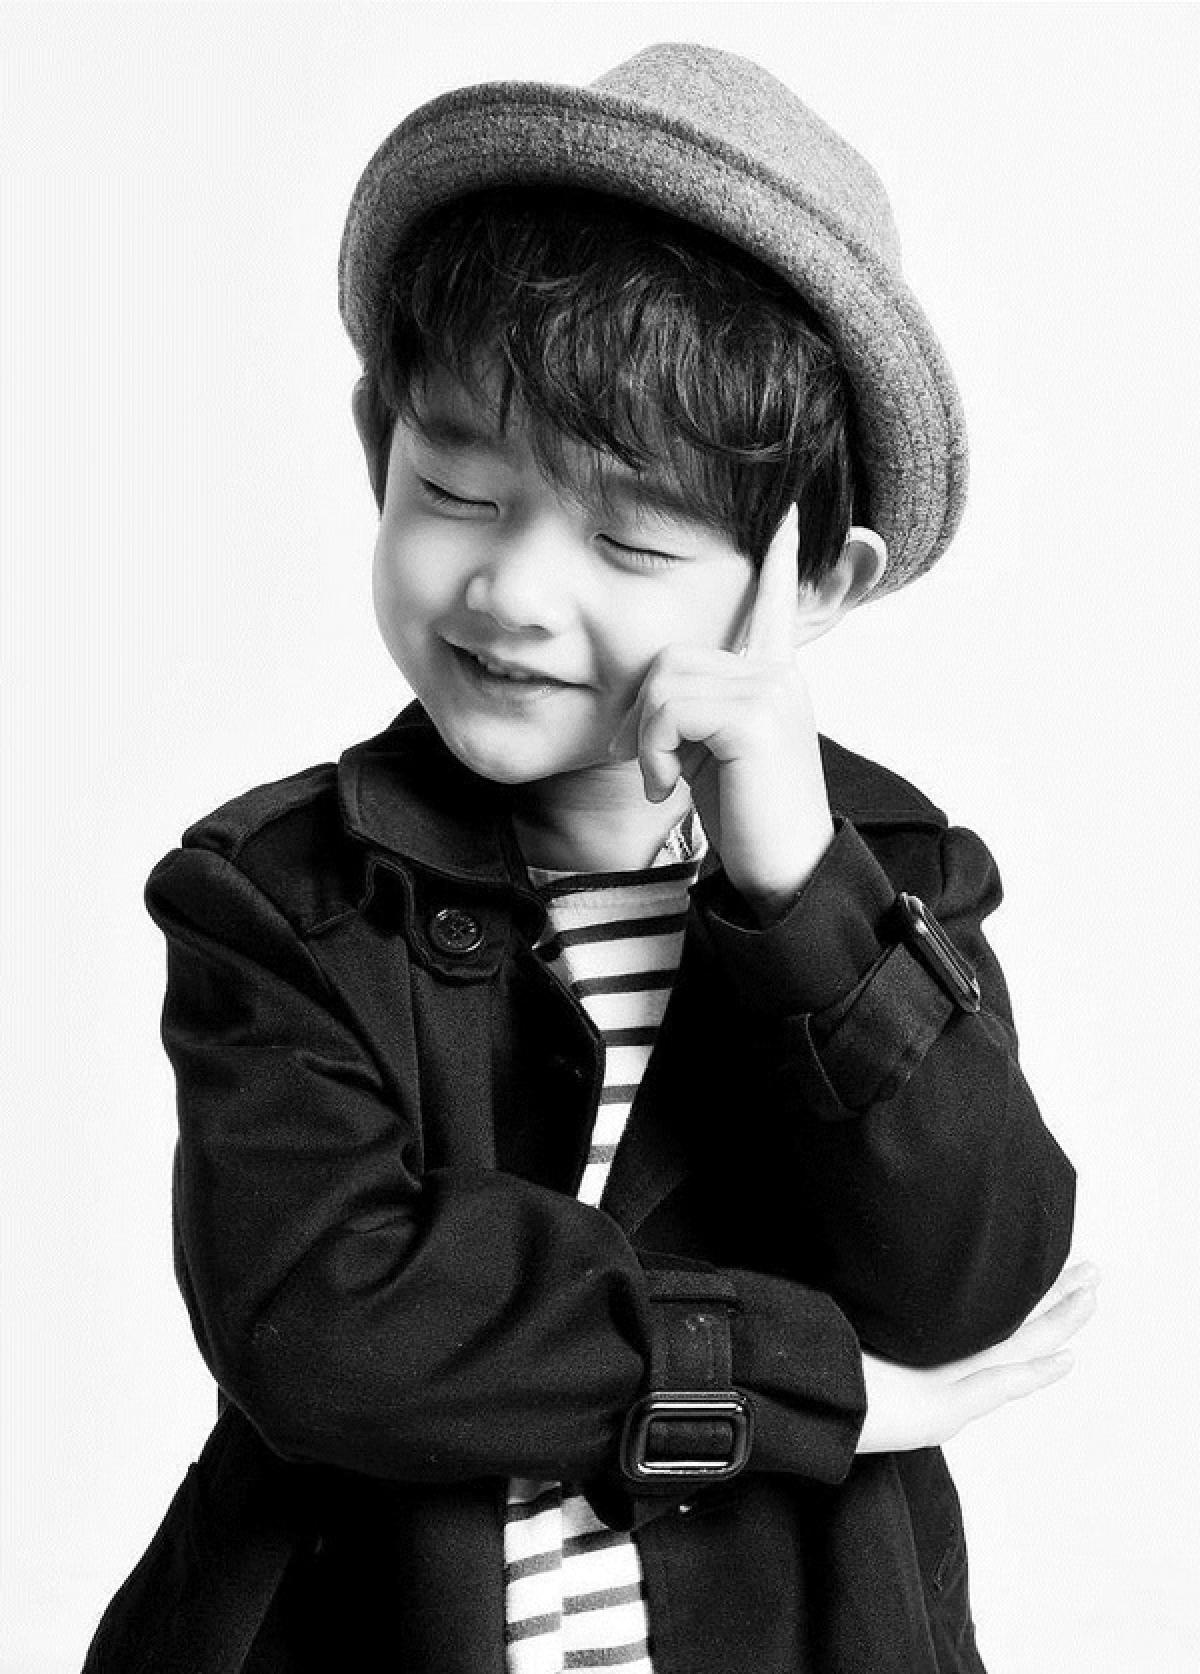 jung-hyun-joon-11-1582275890.jpg